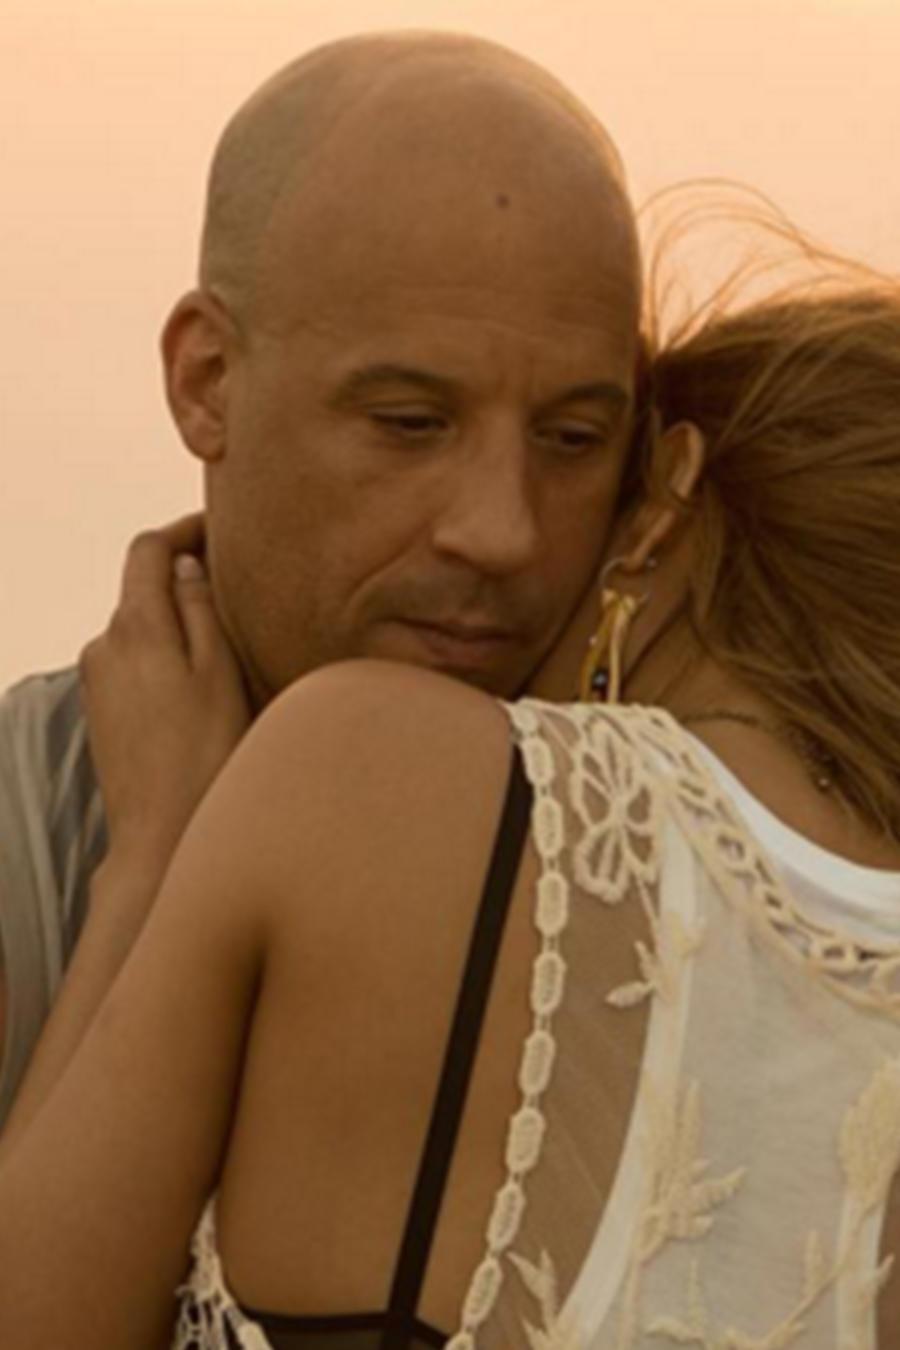 Ariadna Gutiérrez publicó fotos muy íntimas junto a Vin Diesel